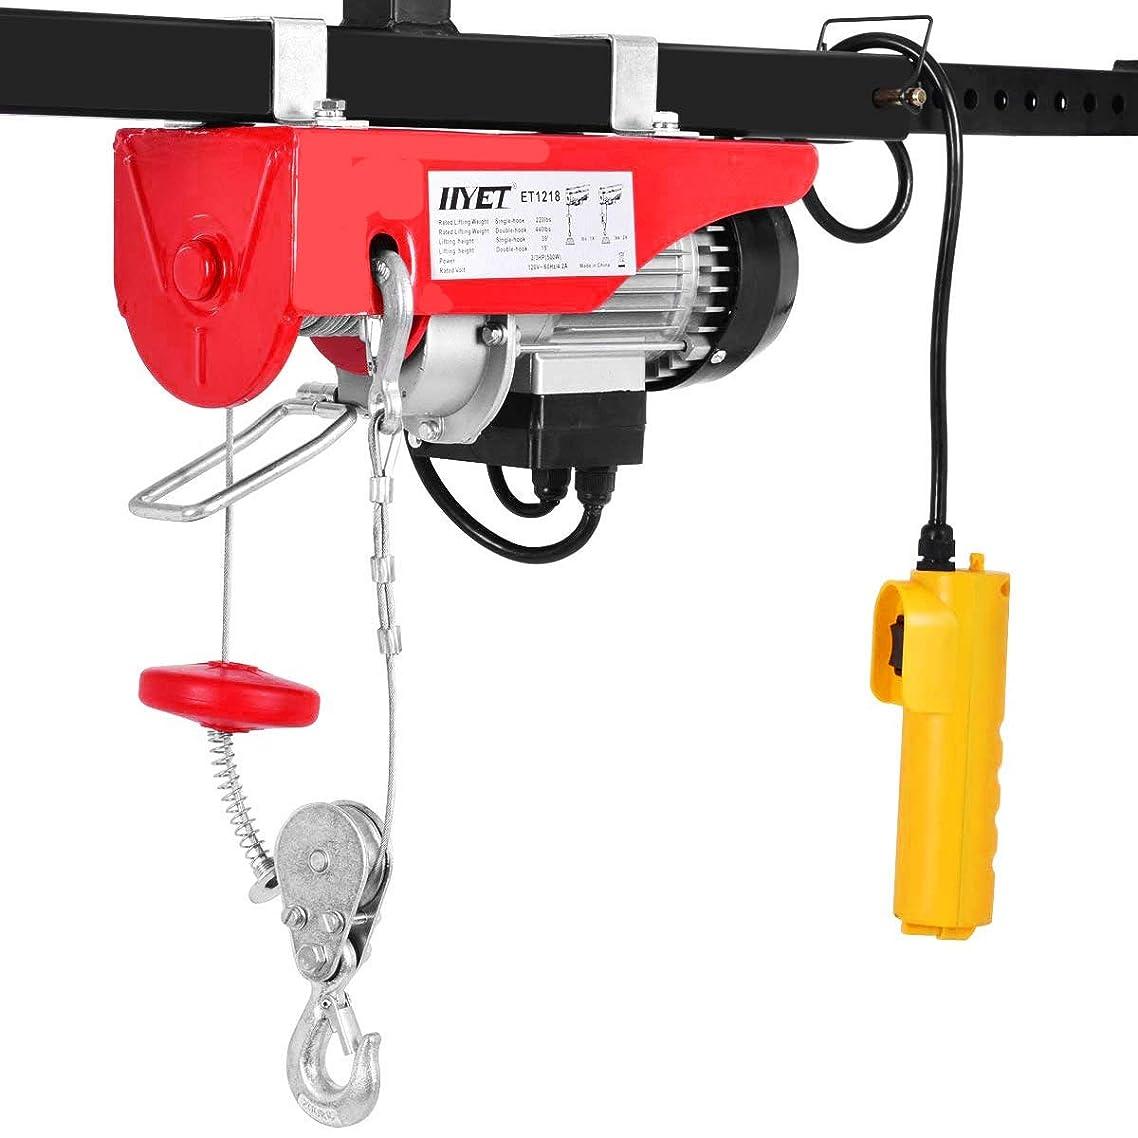 Goplus Lift Electric Hoist Garage Auto Shop Electric Wire Hoist Overhead Lift w/Remote Control (440LBS)